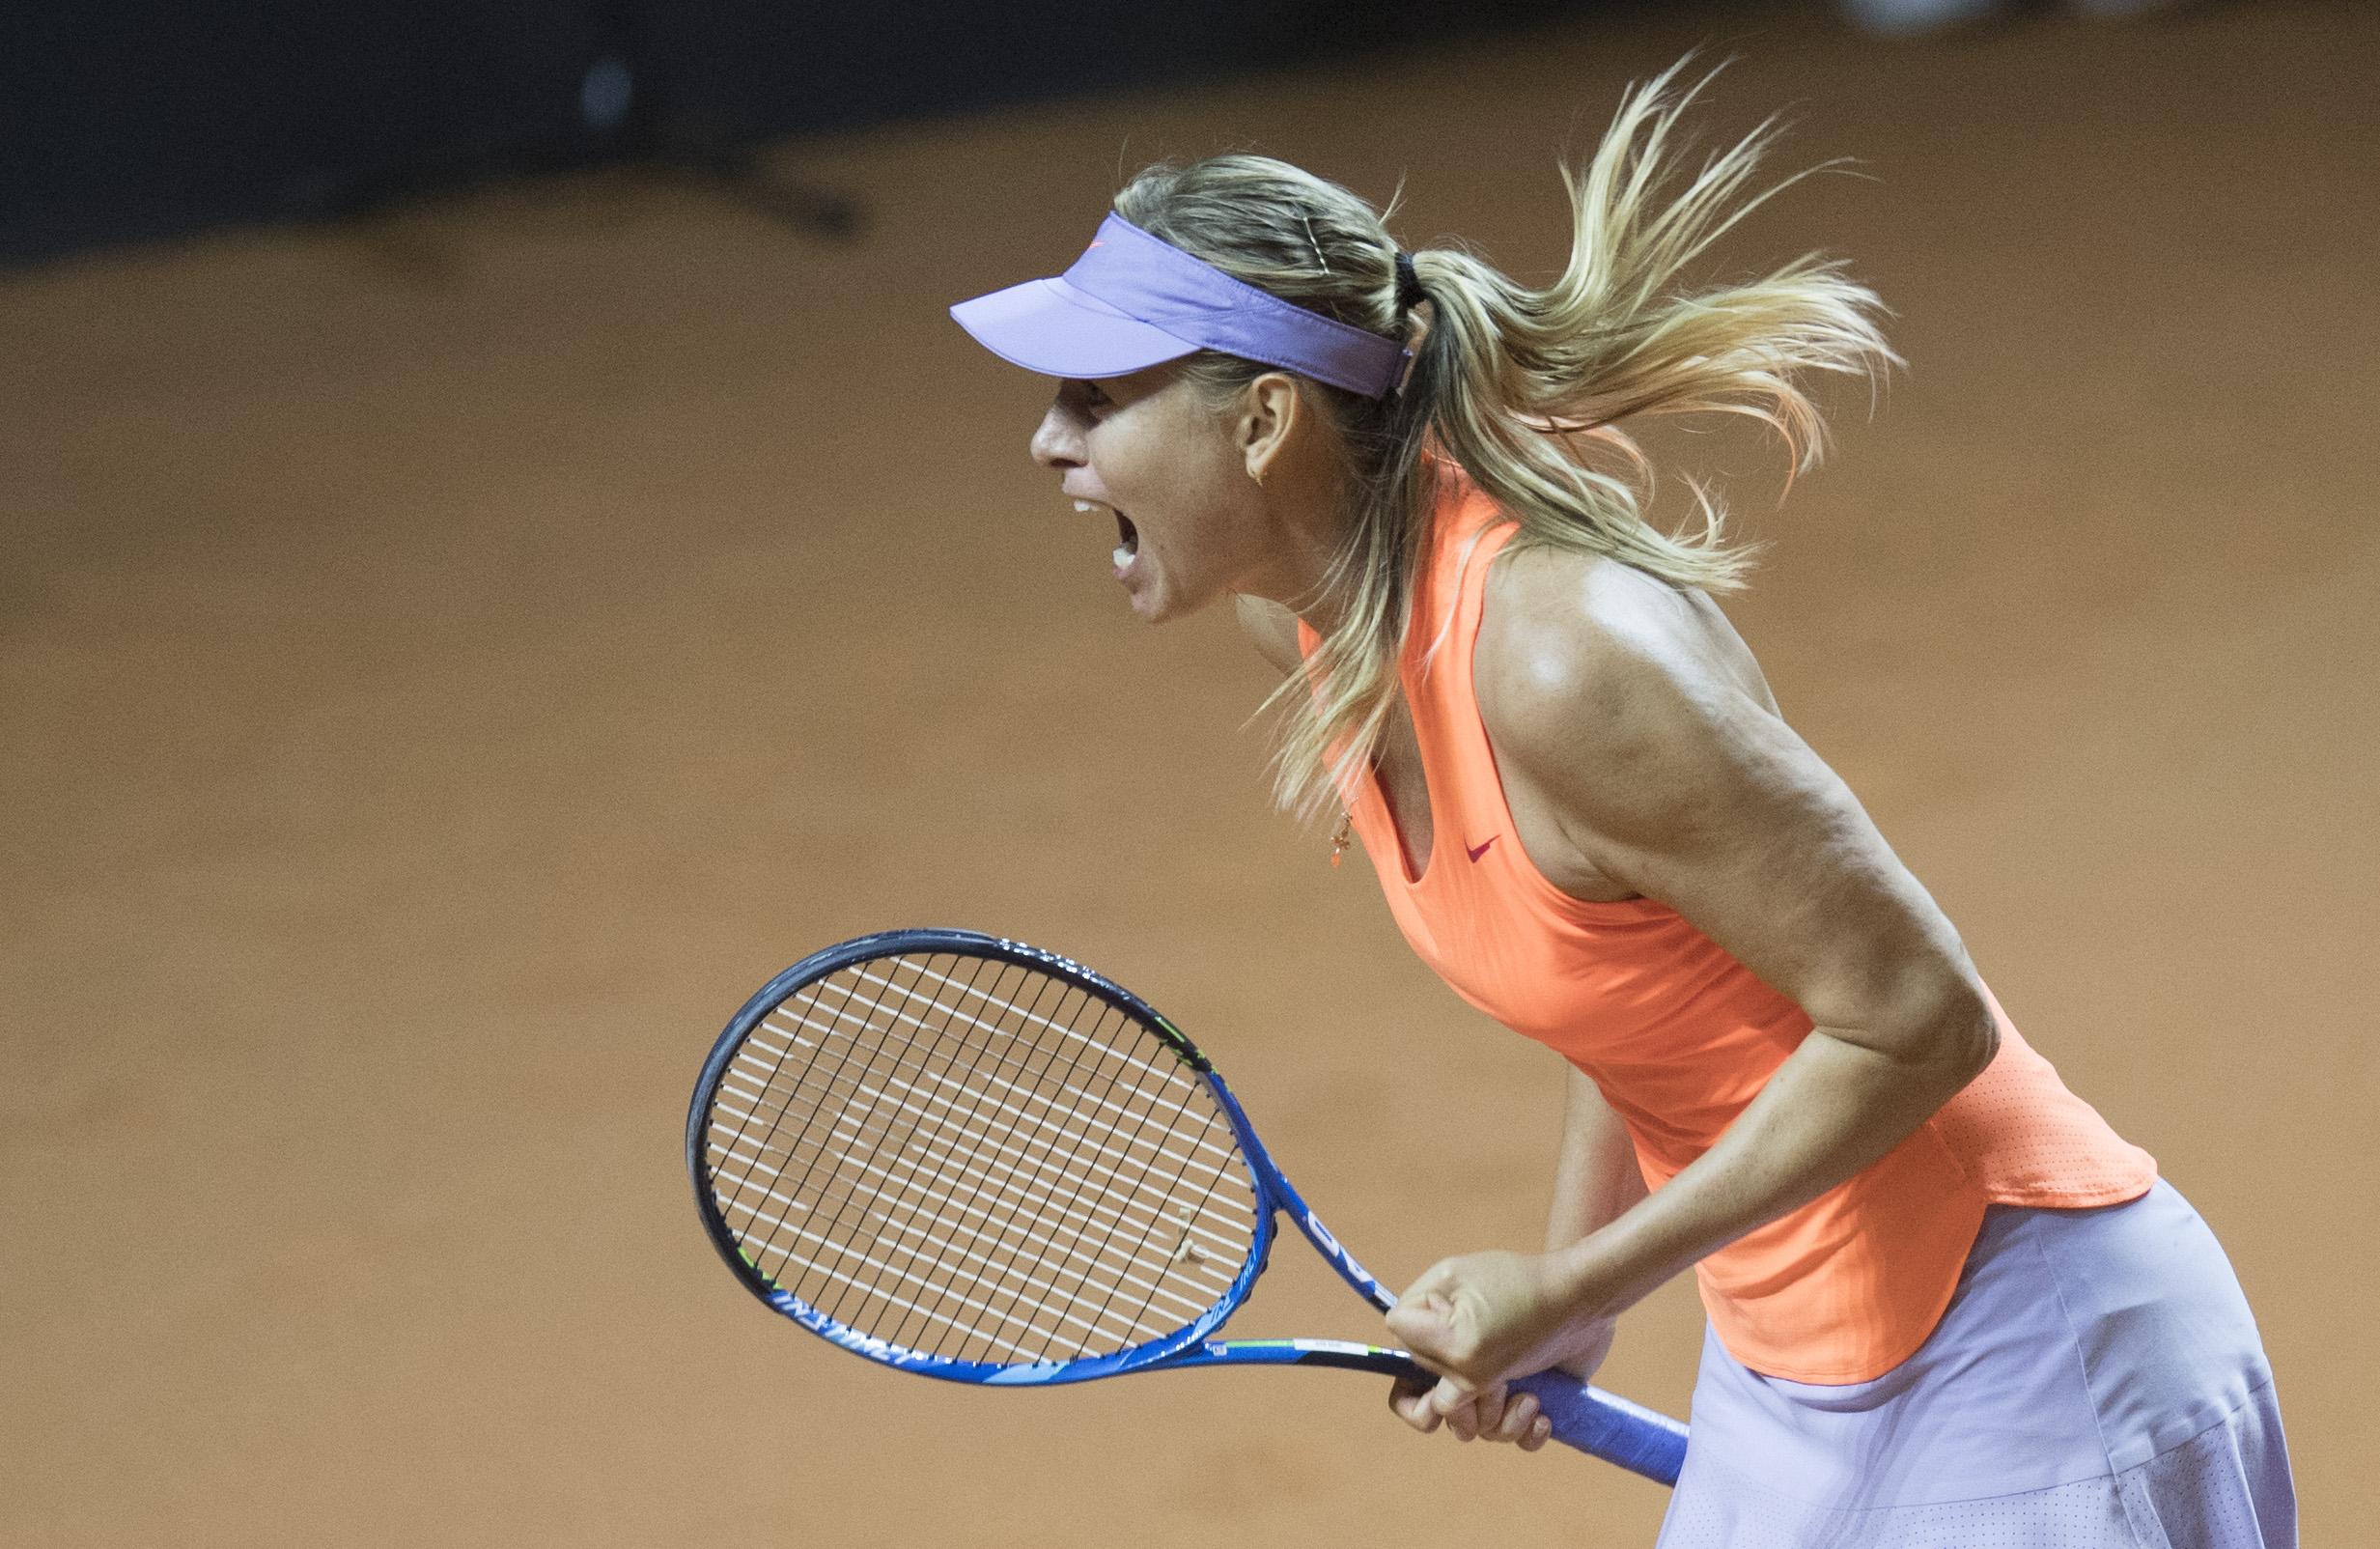 Tennis - WTA - Retour gagnant pour Sharapova après sa suspension pour dopage